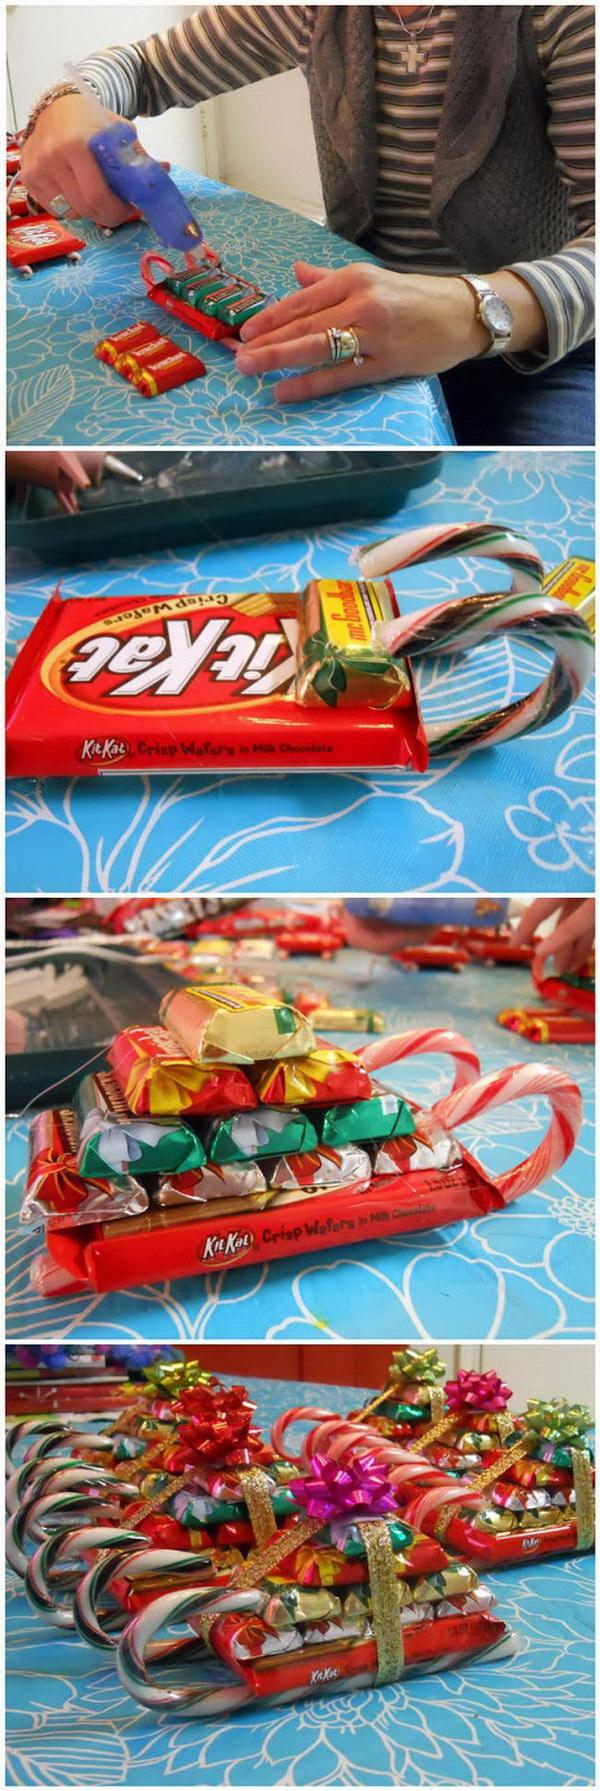 Easy fast homemade christmas gift ideas